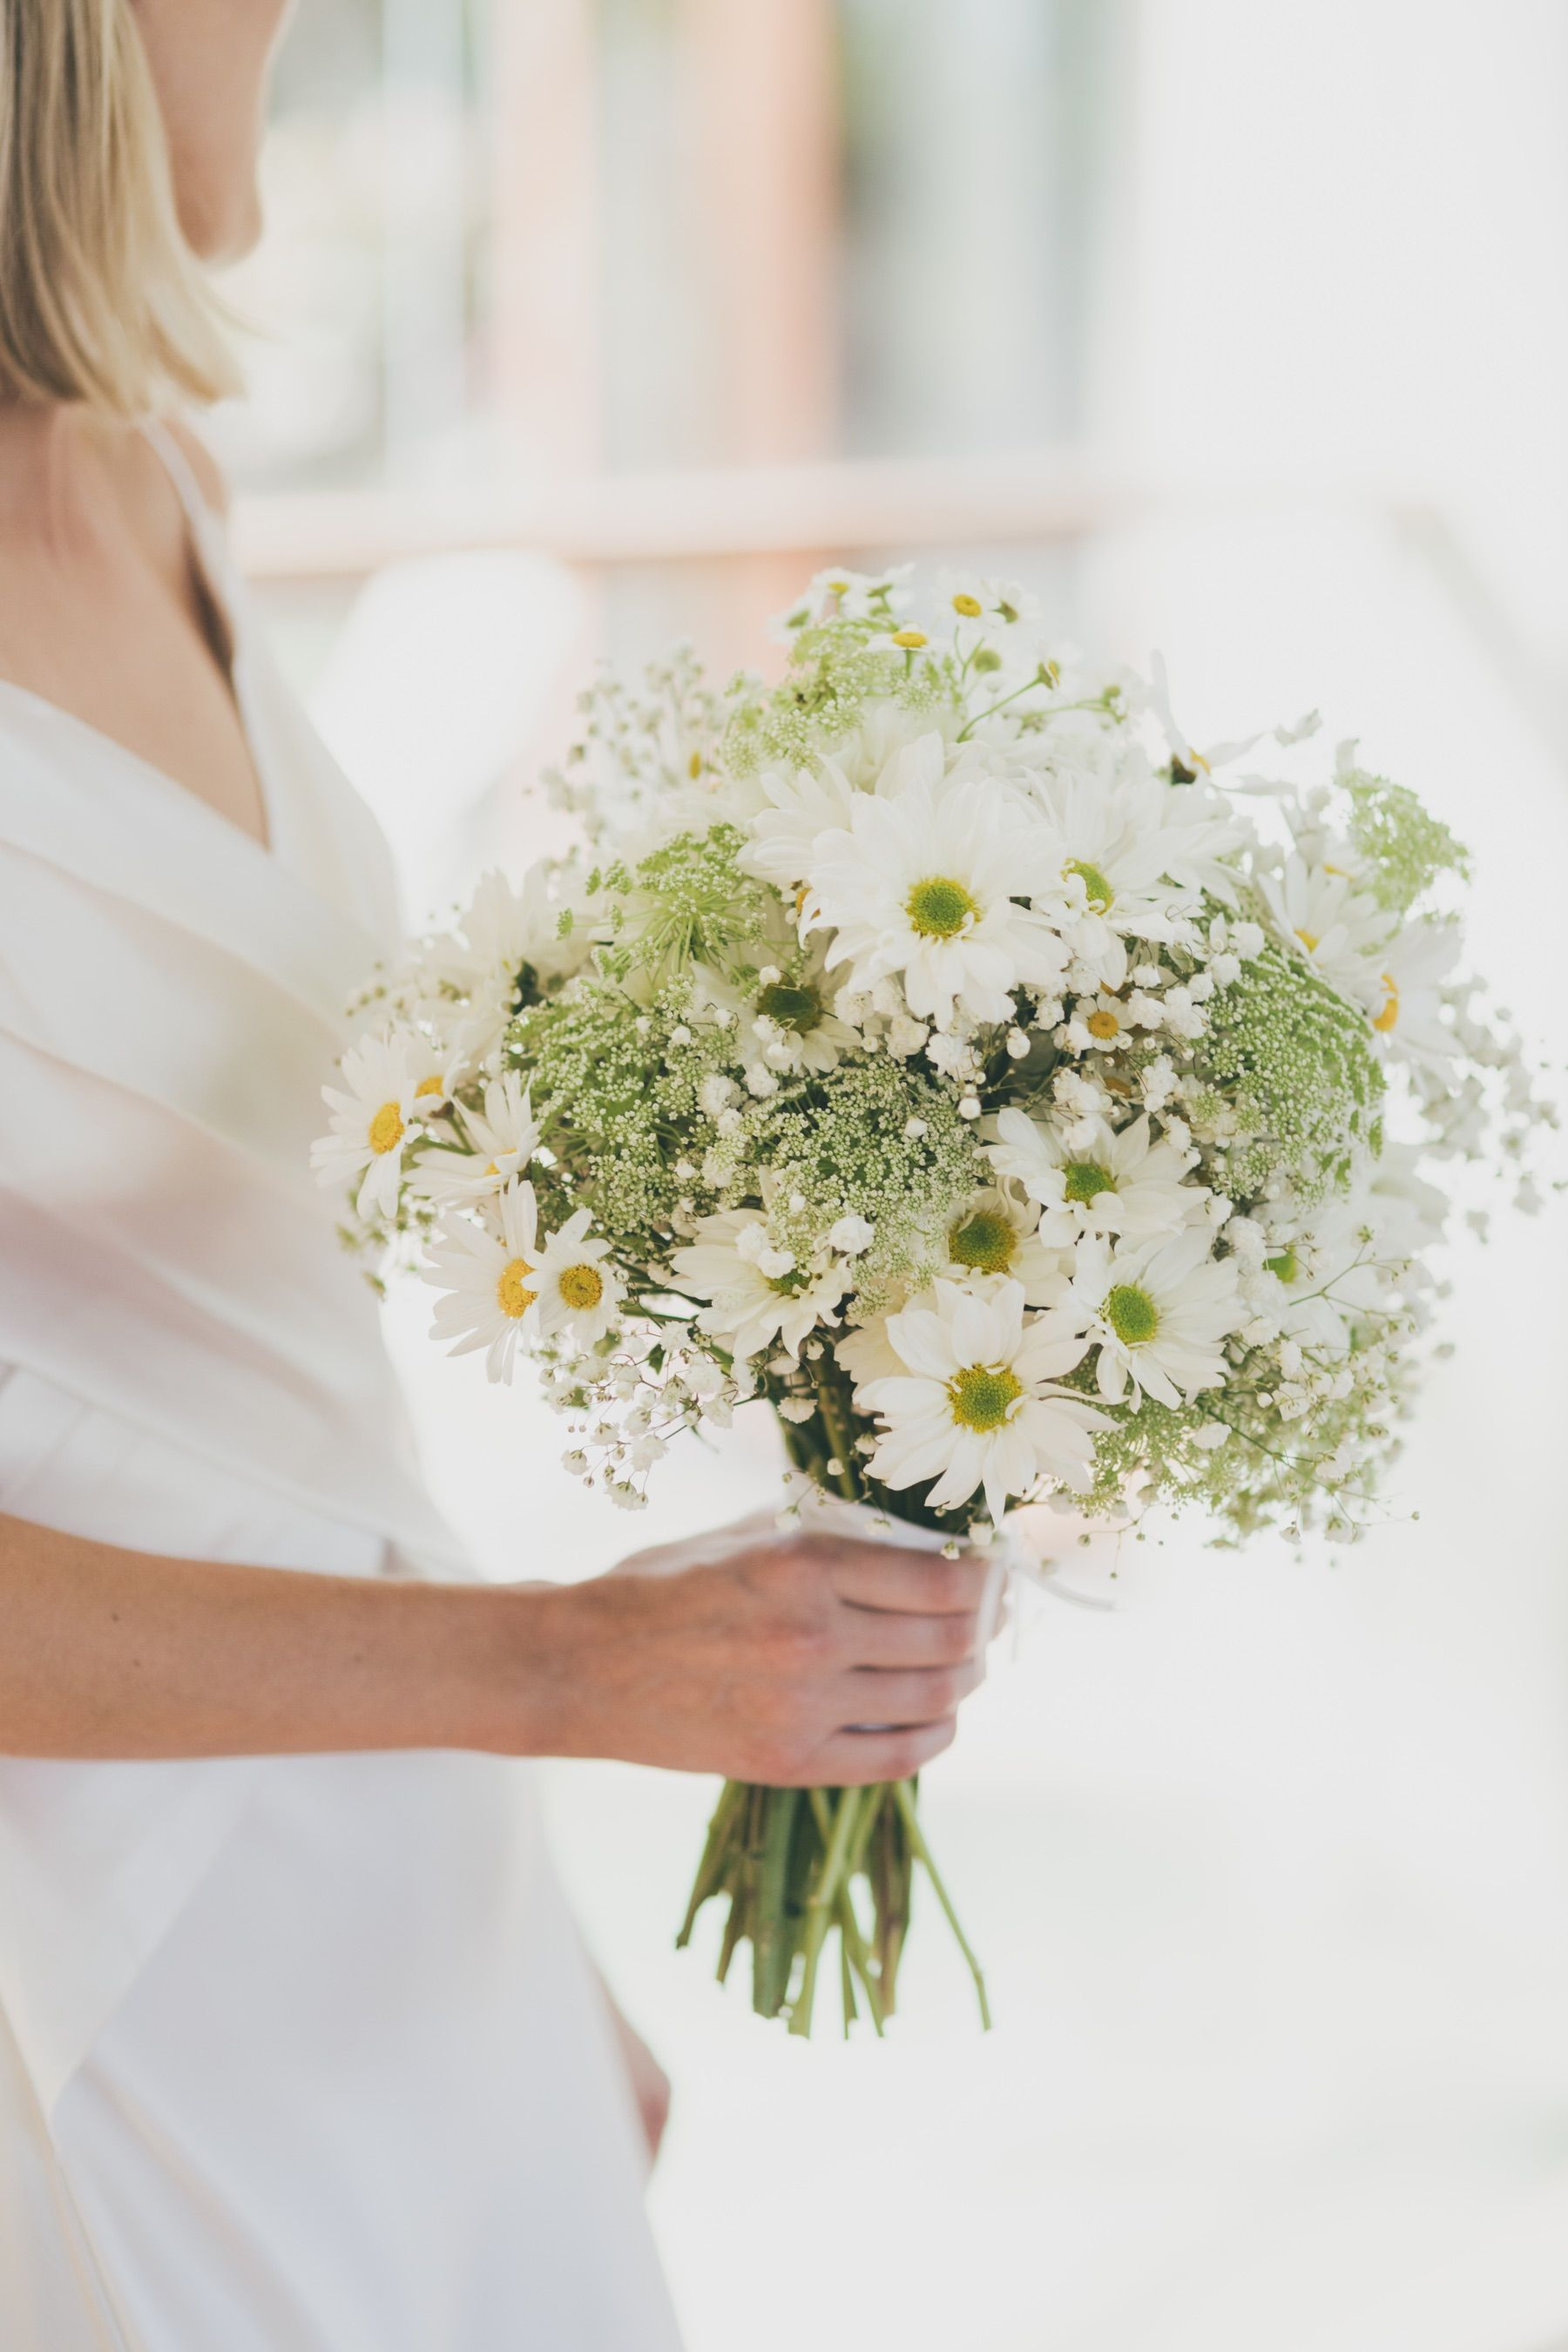 Daisies Daisy Bouquet Wedding Wedding Flowers Summer Babys